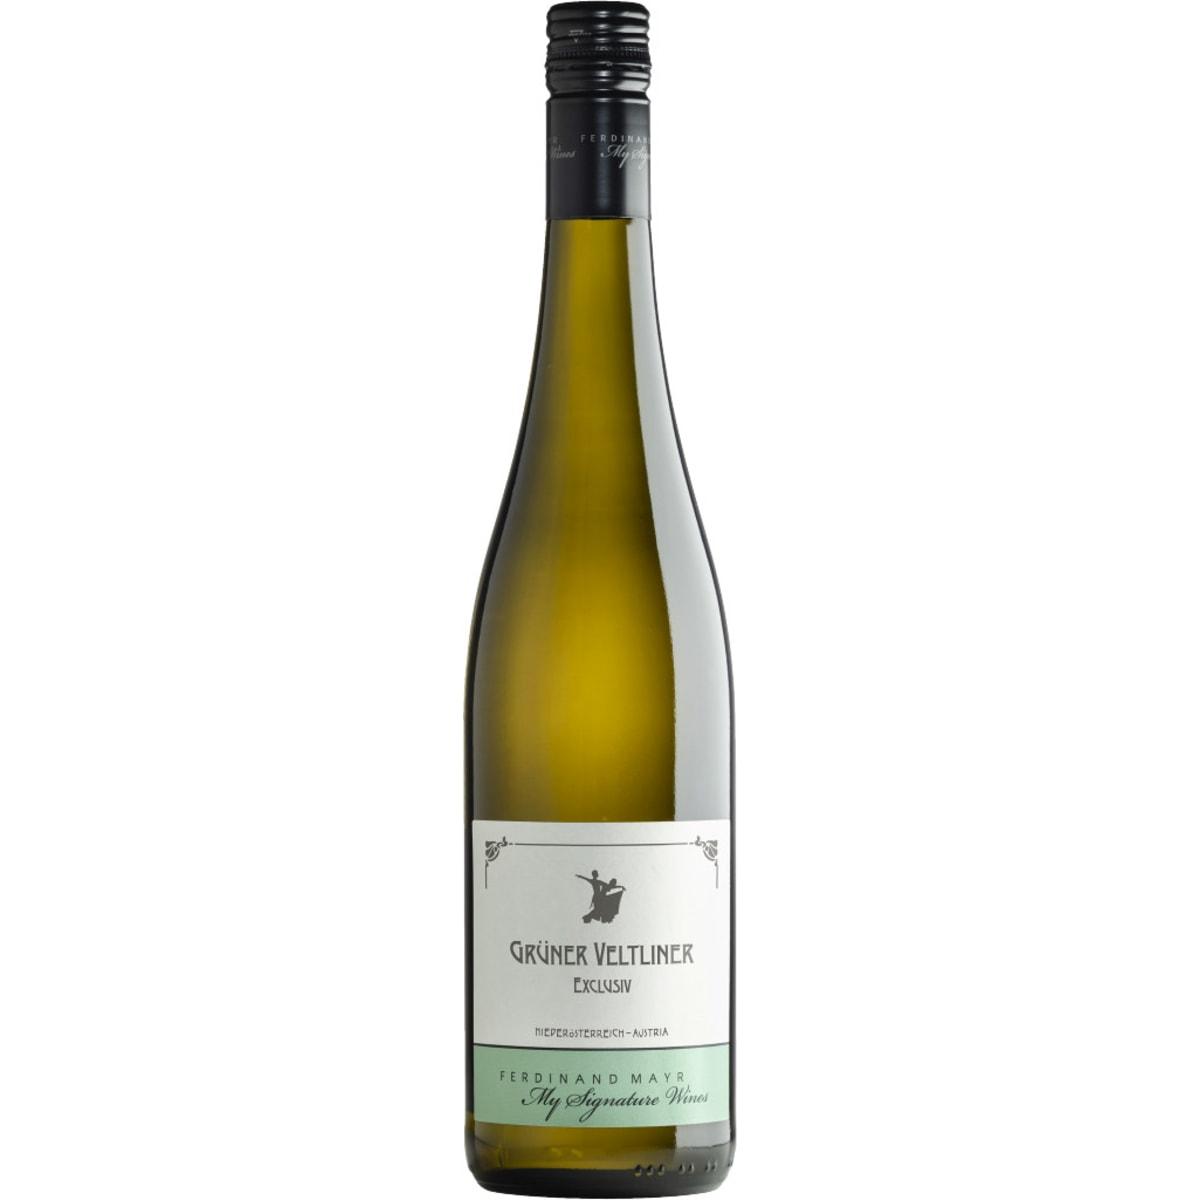 F.Mayr GV Exclusiv My Signature Wines